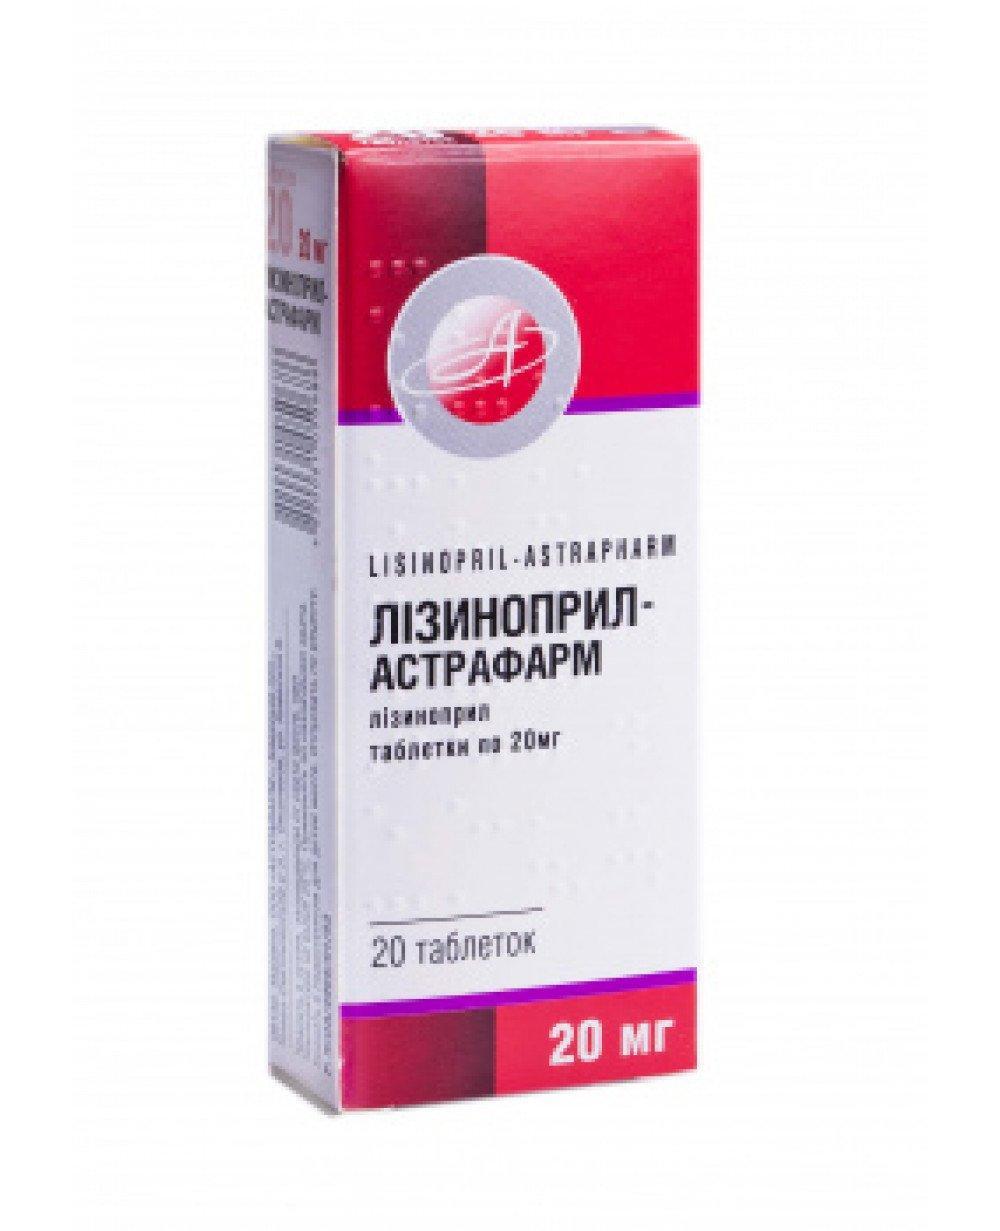 Лизиноприл-Астрафарм таблетки 20 мг N60_600698905e493.jpeg